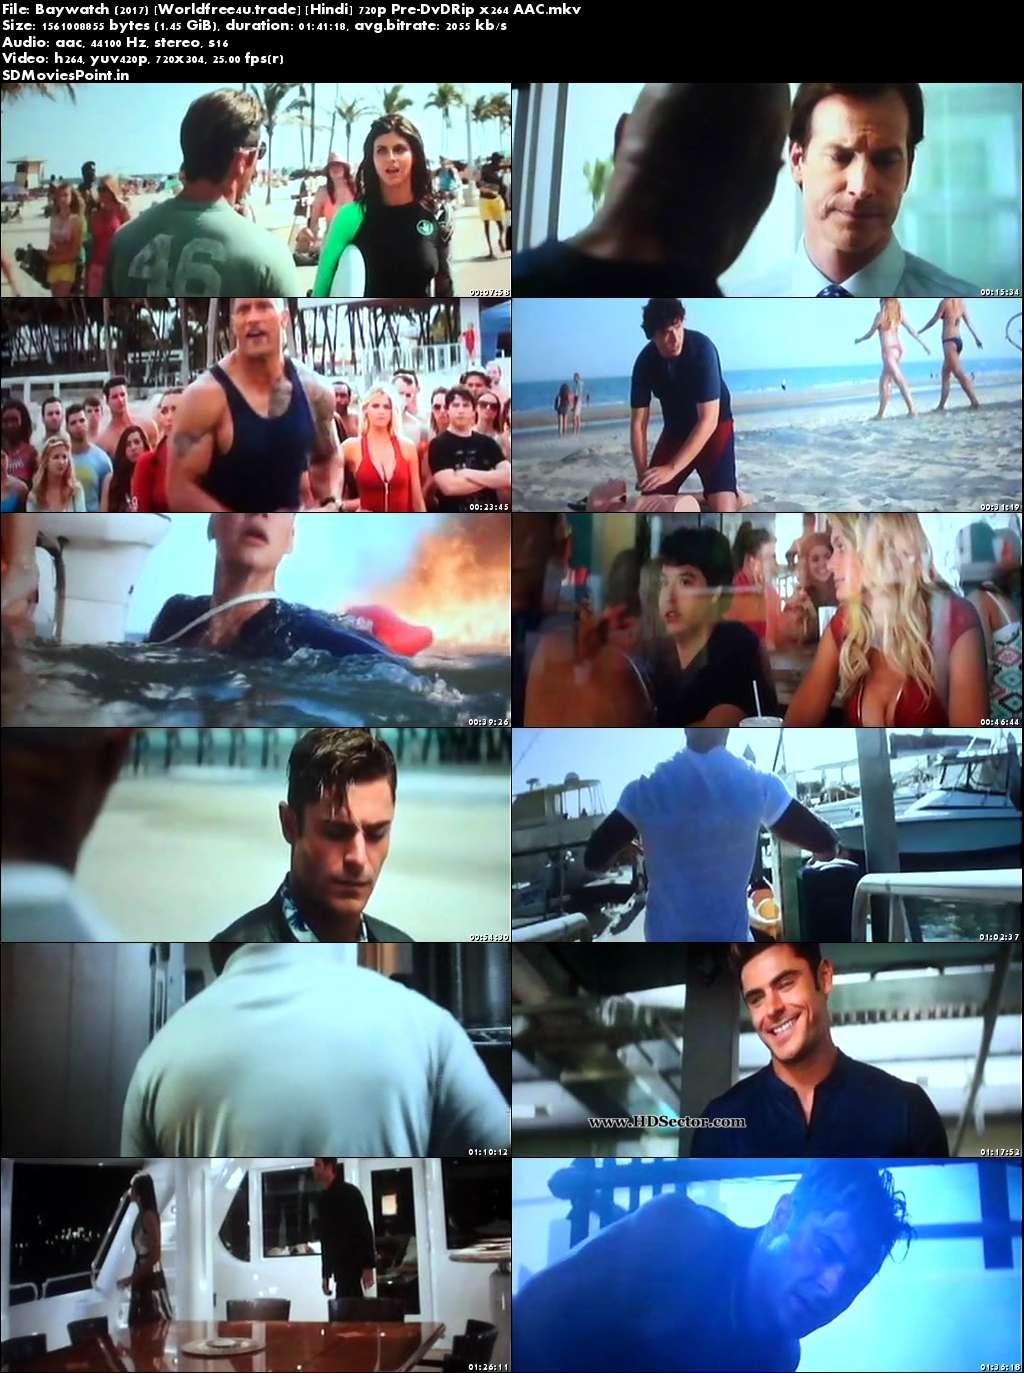 Screen Shot Baywatch 2017 Full Movie Download Hindi Dual Audio